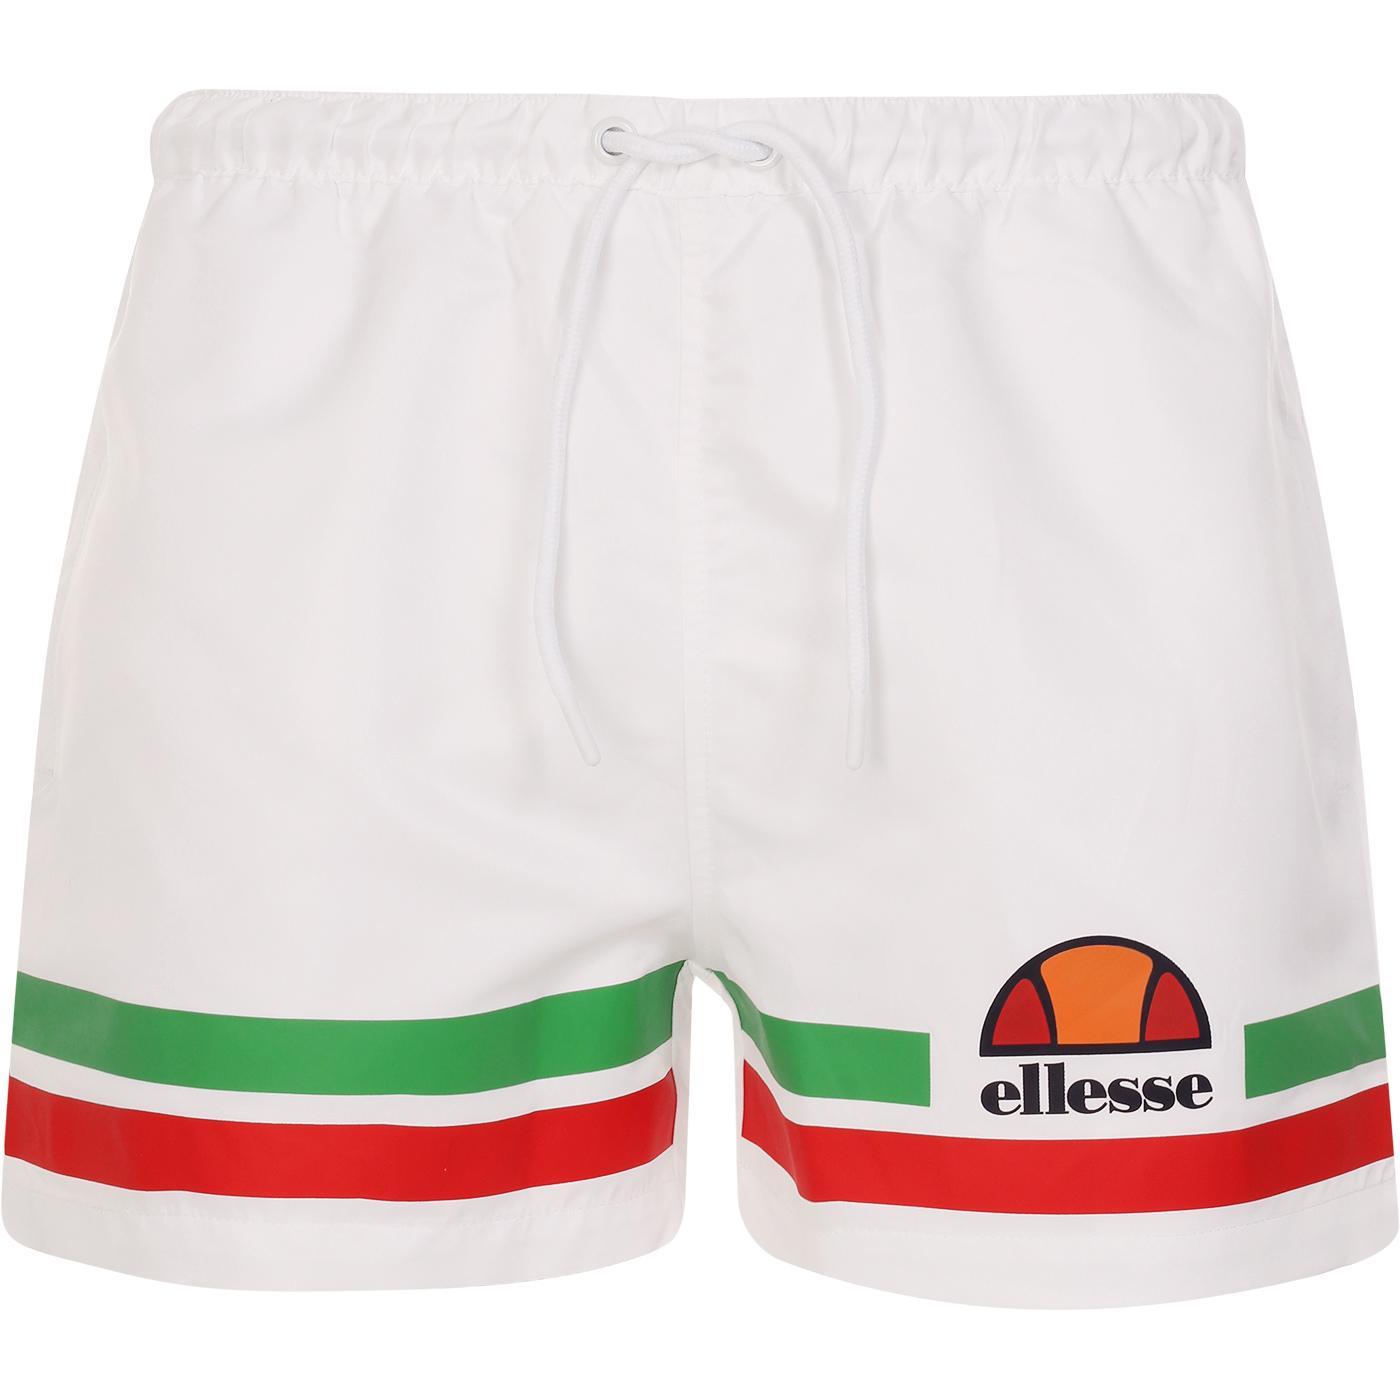 Tello ELLESSE Retro Stripe Swim Shorts (Italy)